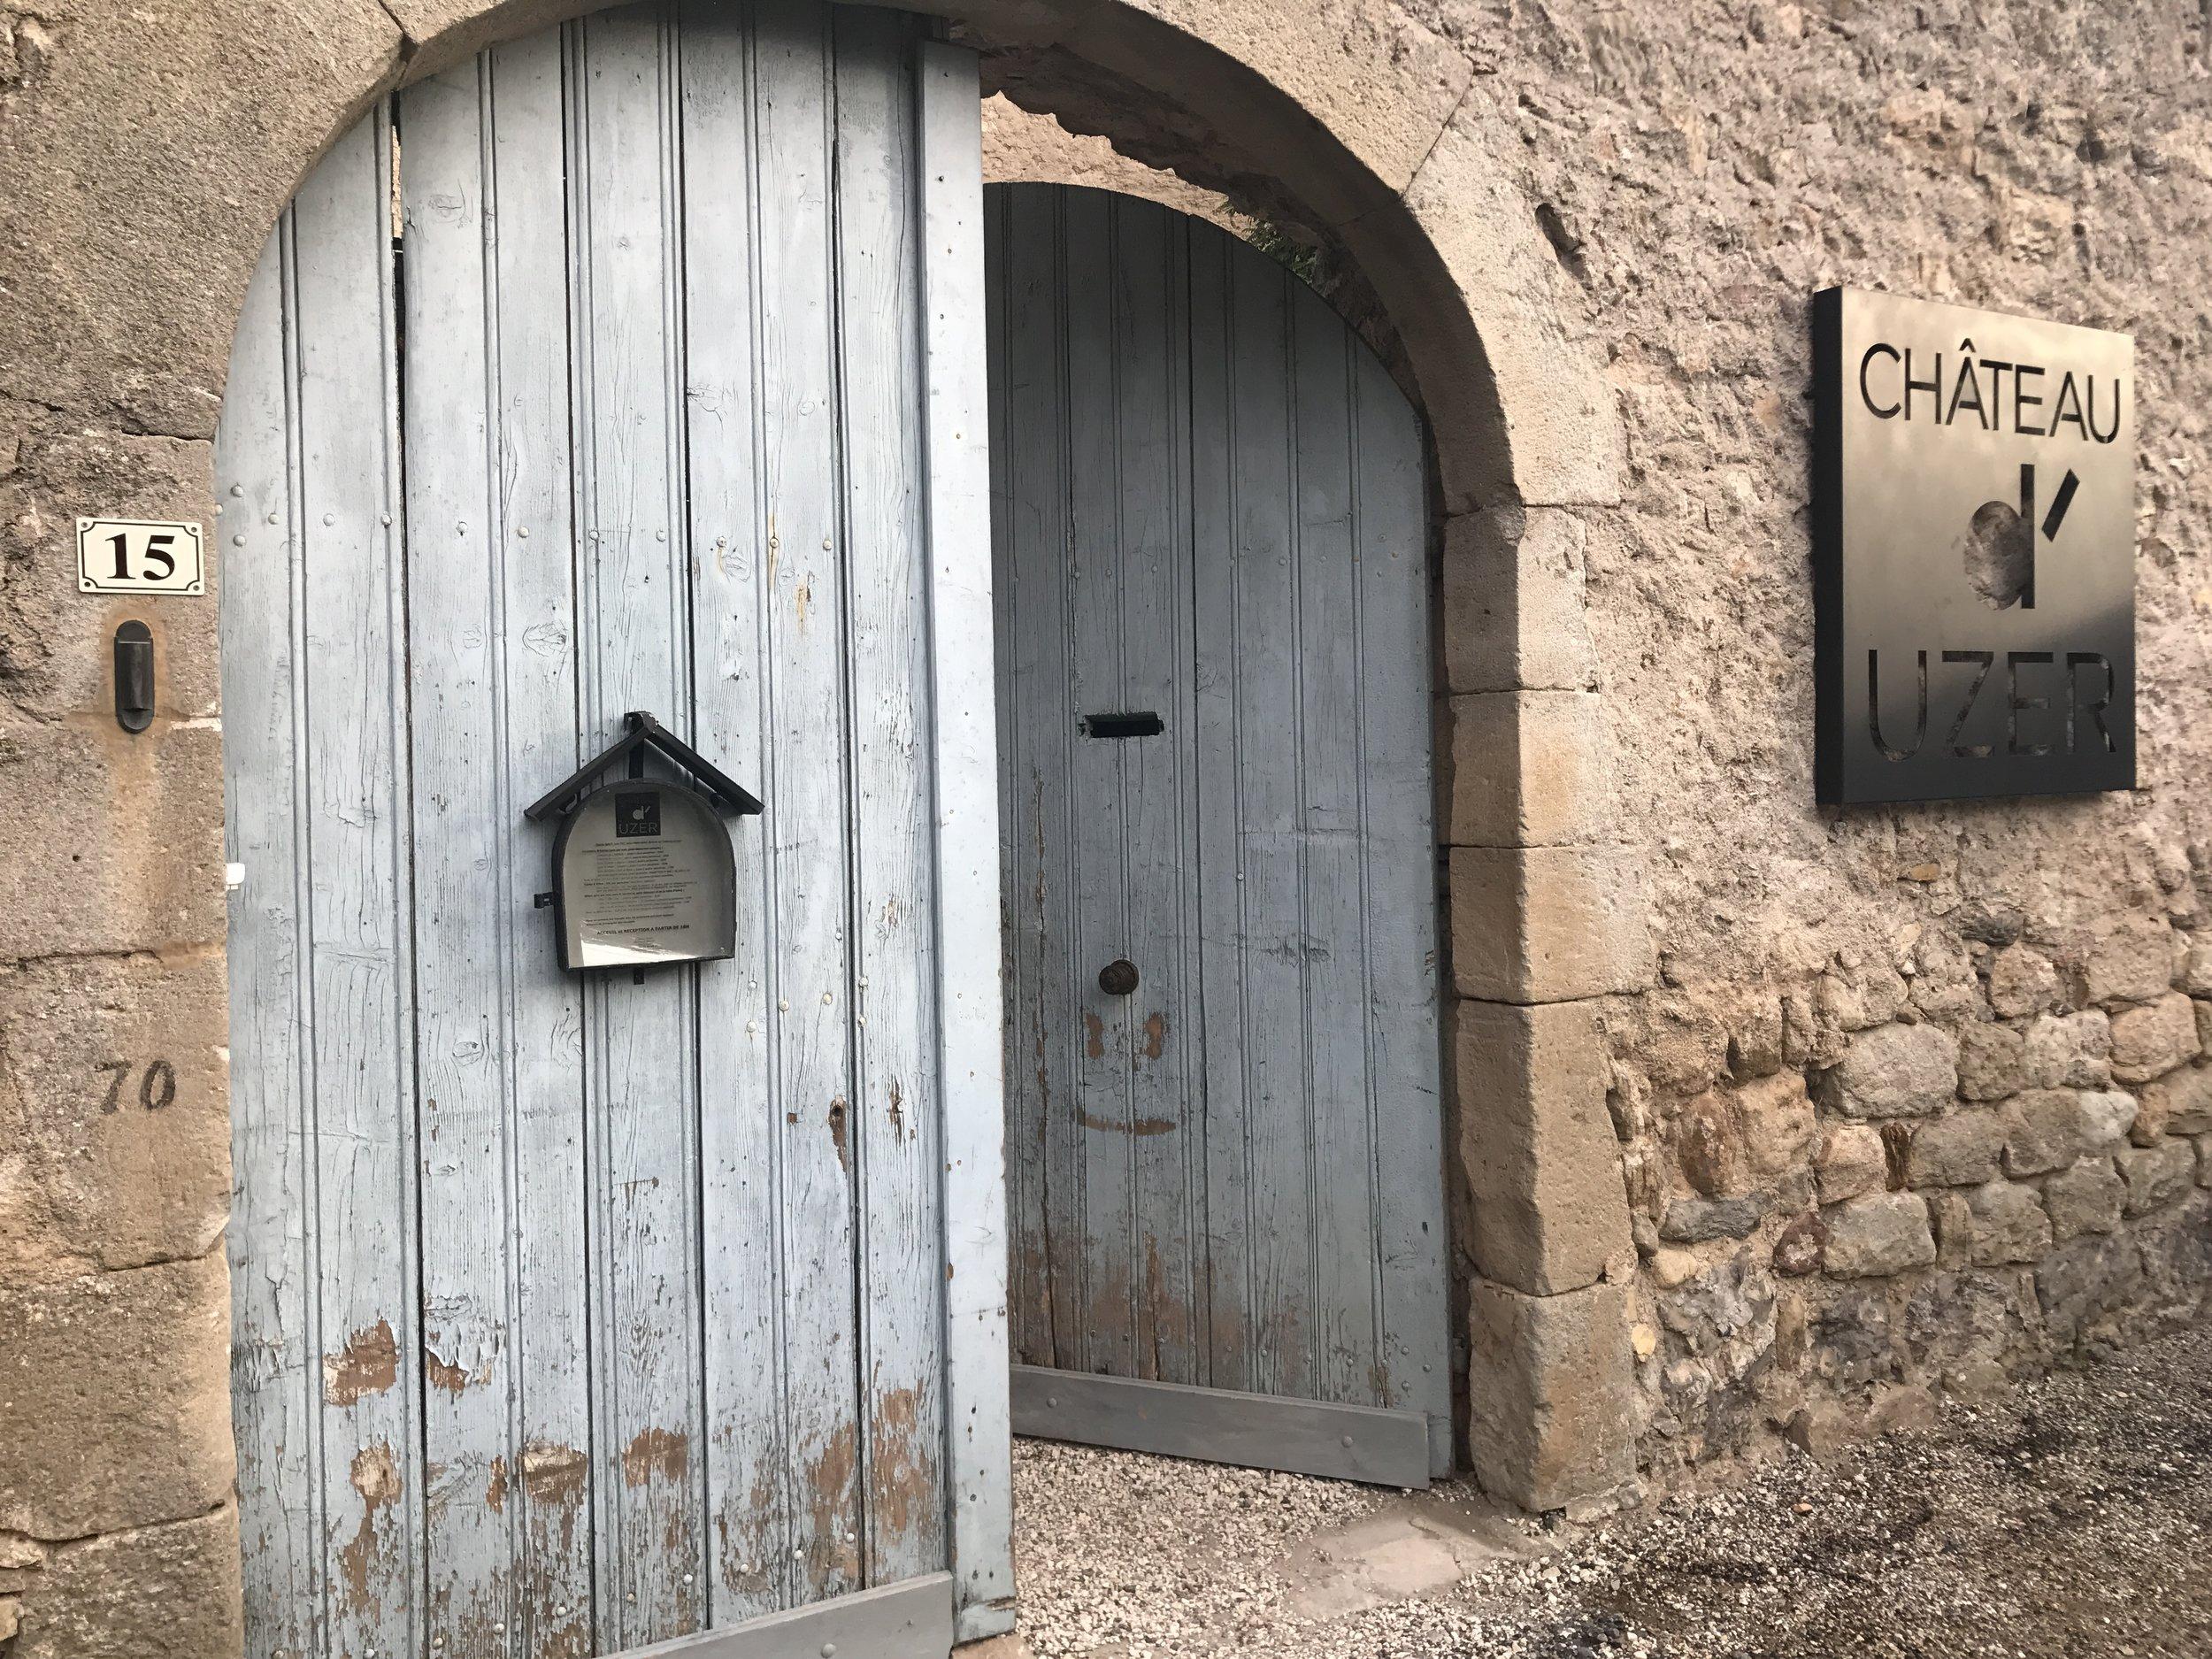 Chateau d'Uzer. Pic @jabberingjourno